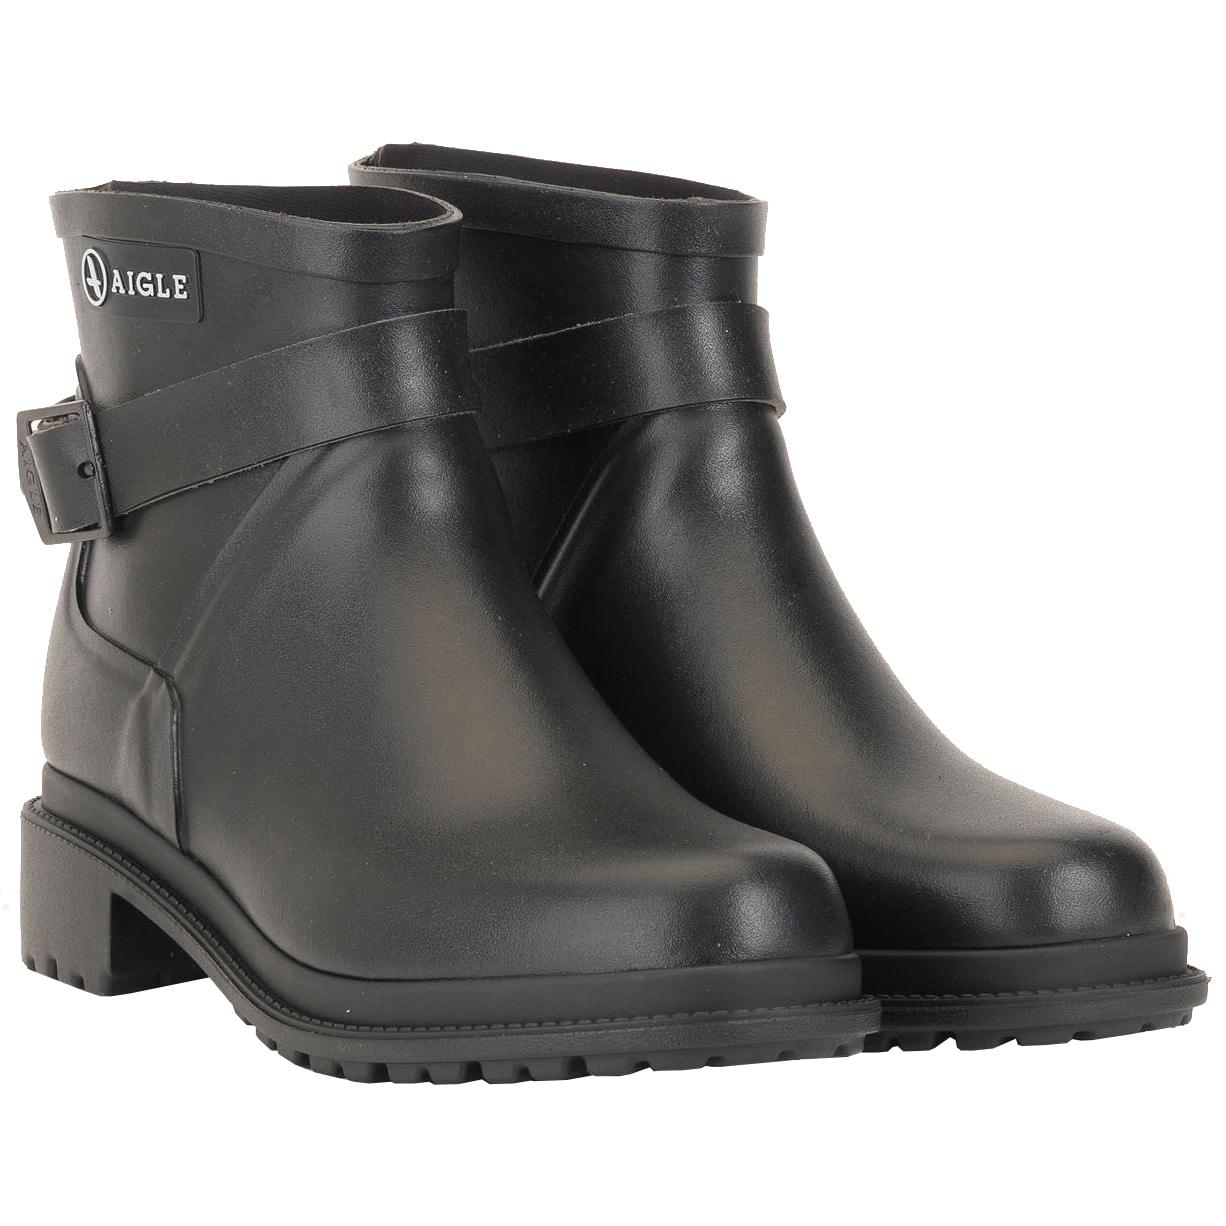 3aec066ef Aigle Macadames Low, Ladies Ankle Boot in Black | Wellies.com